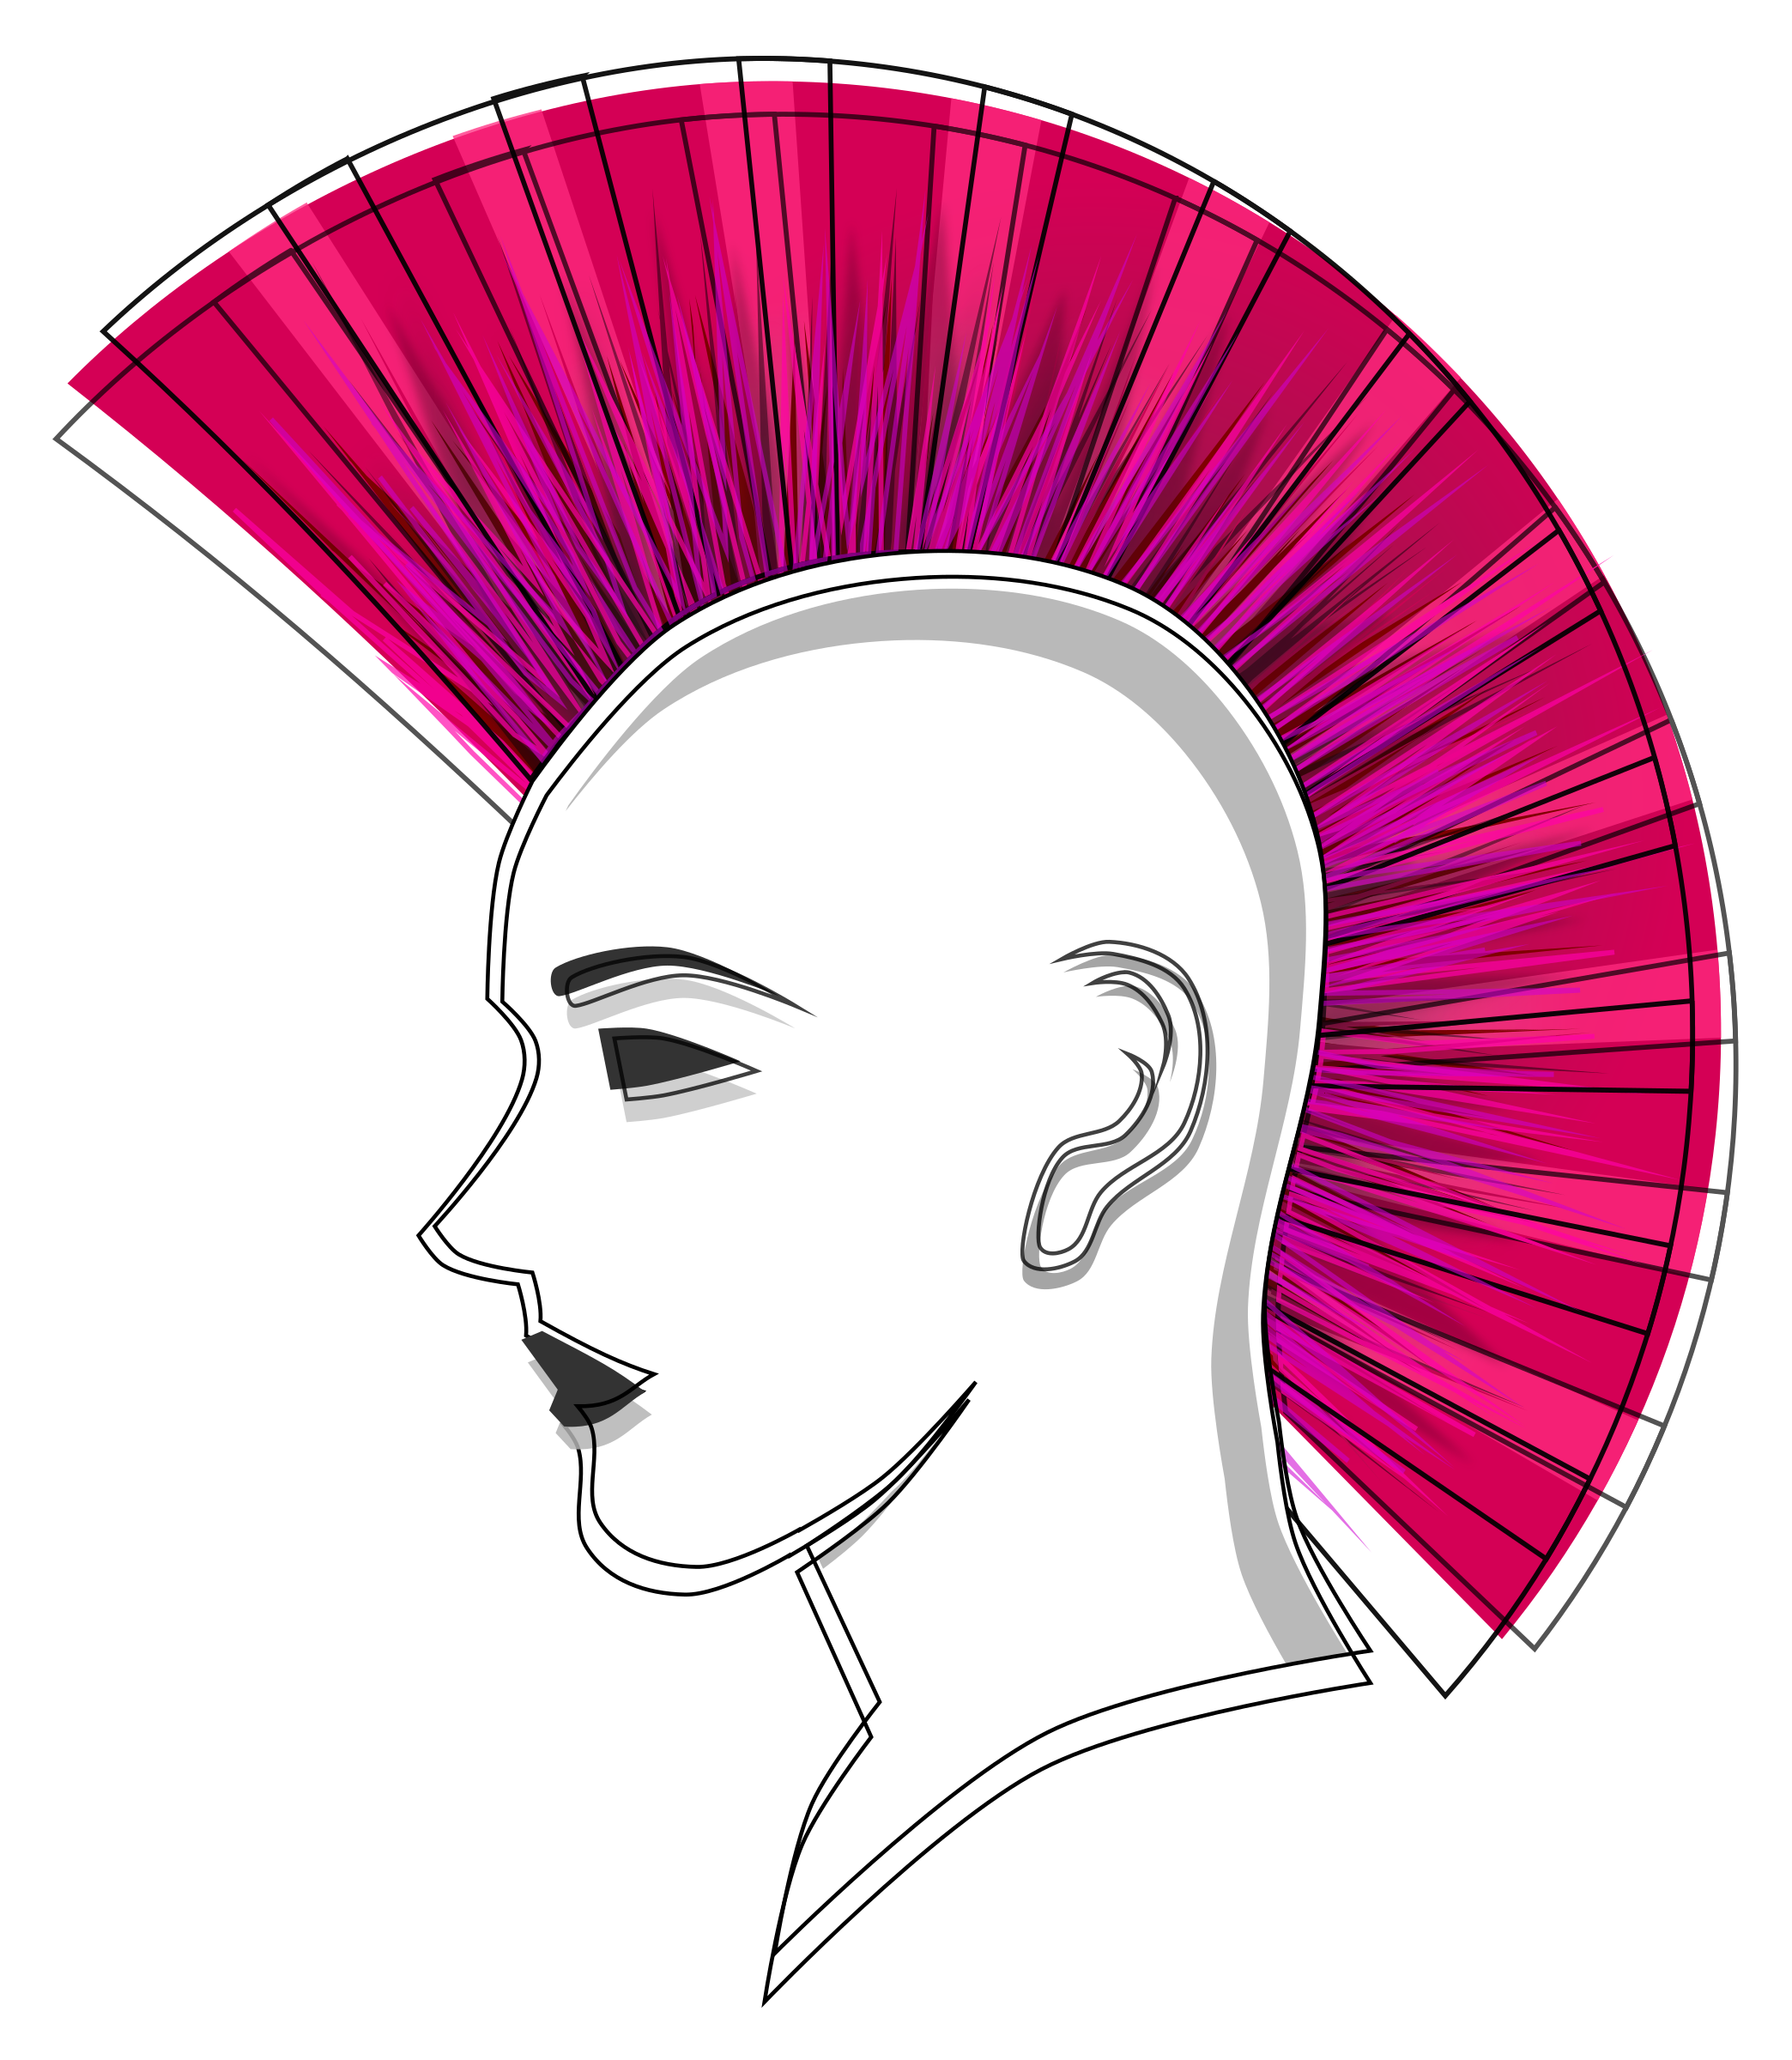 BIG IMAGE (PNG) - Mohawk Hair PNG